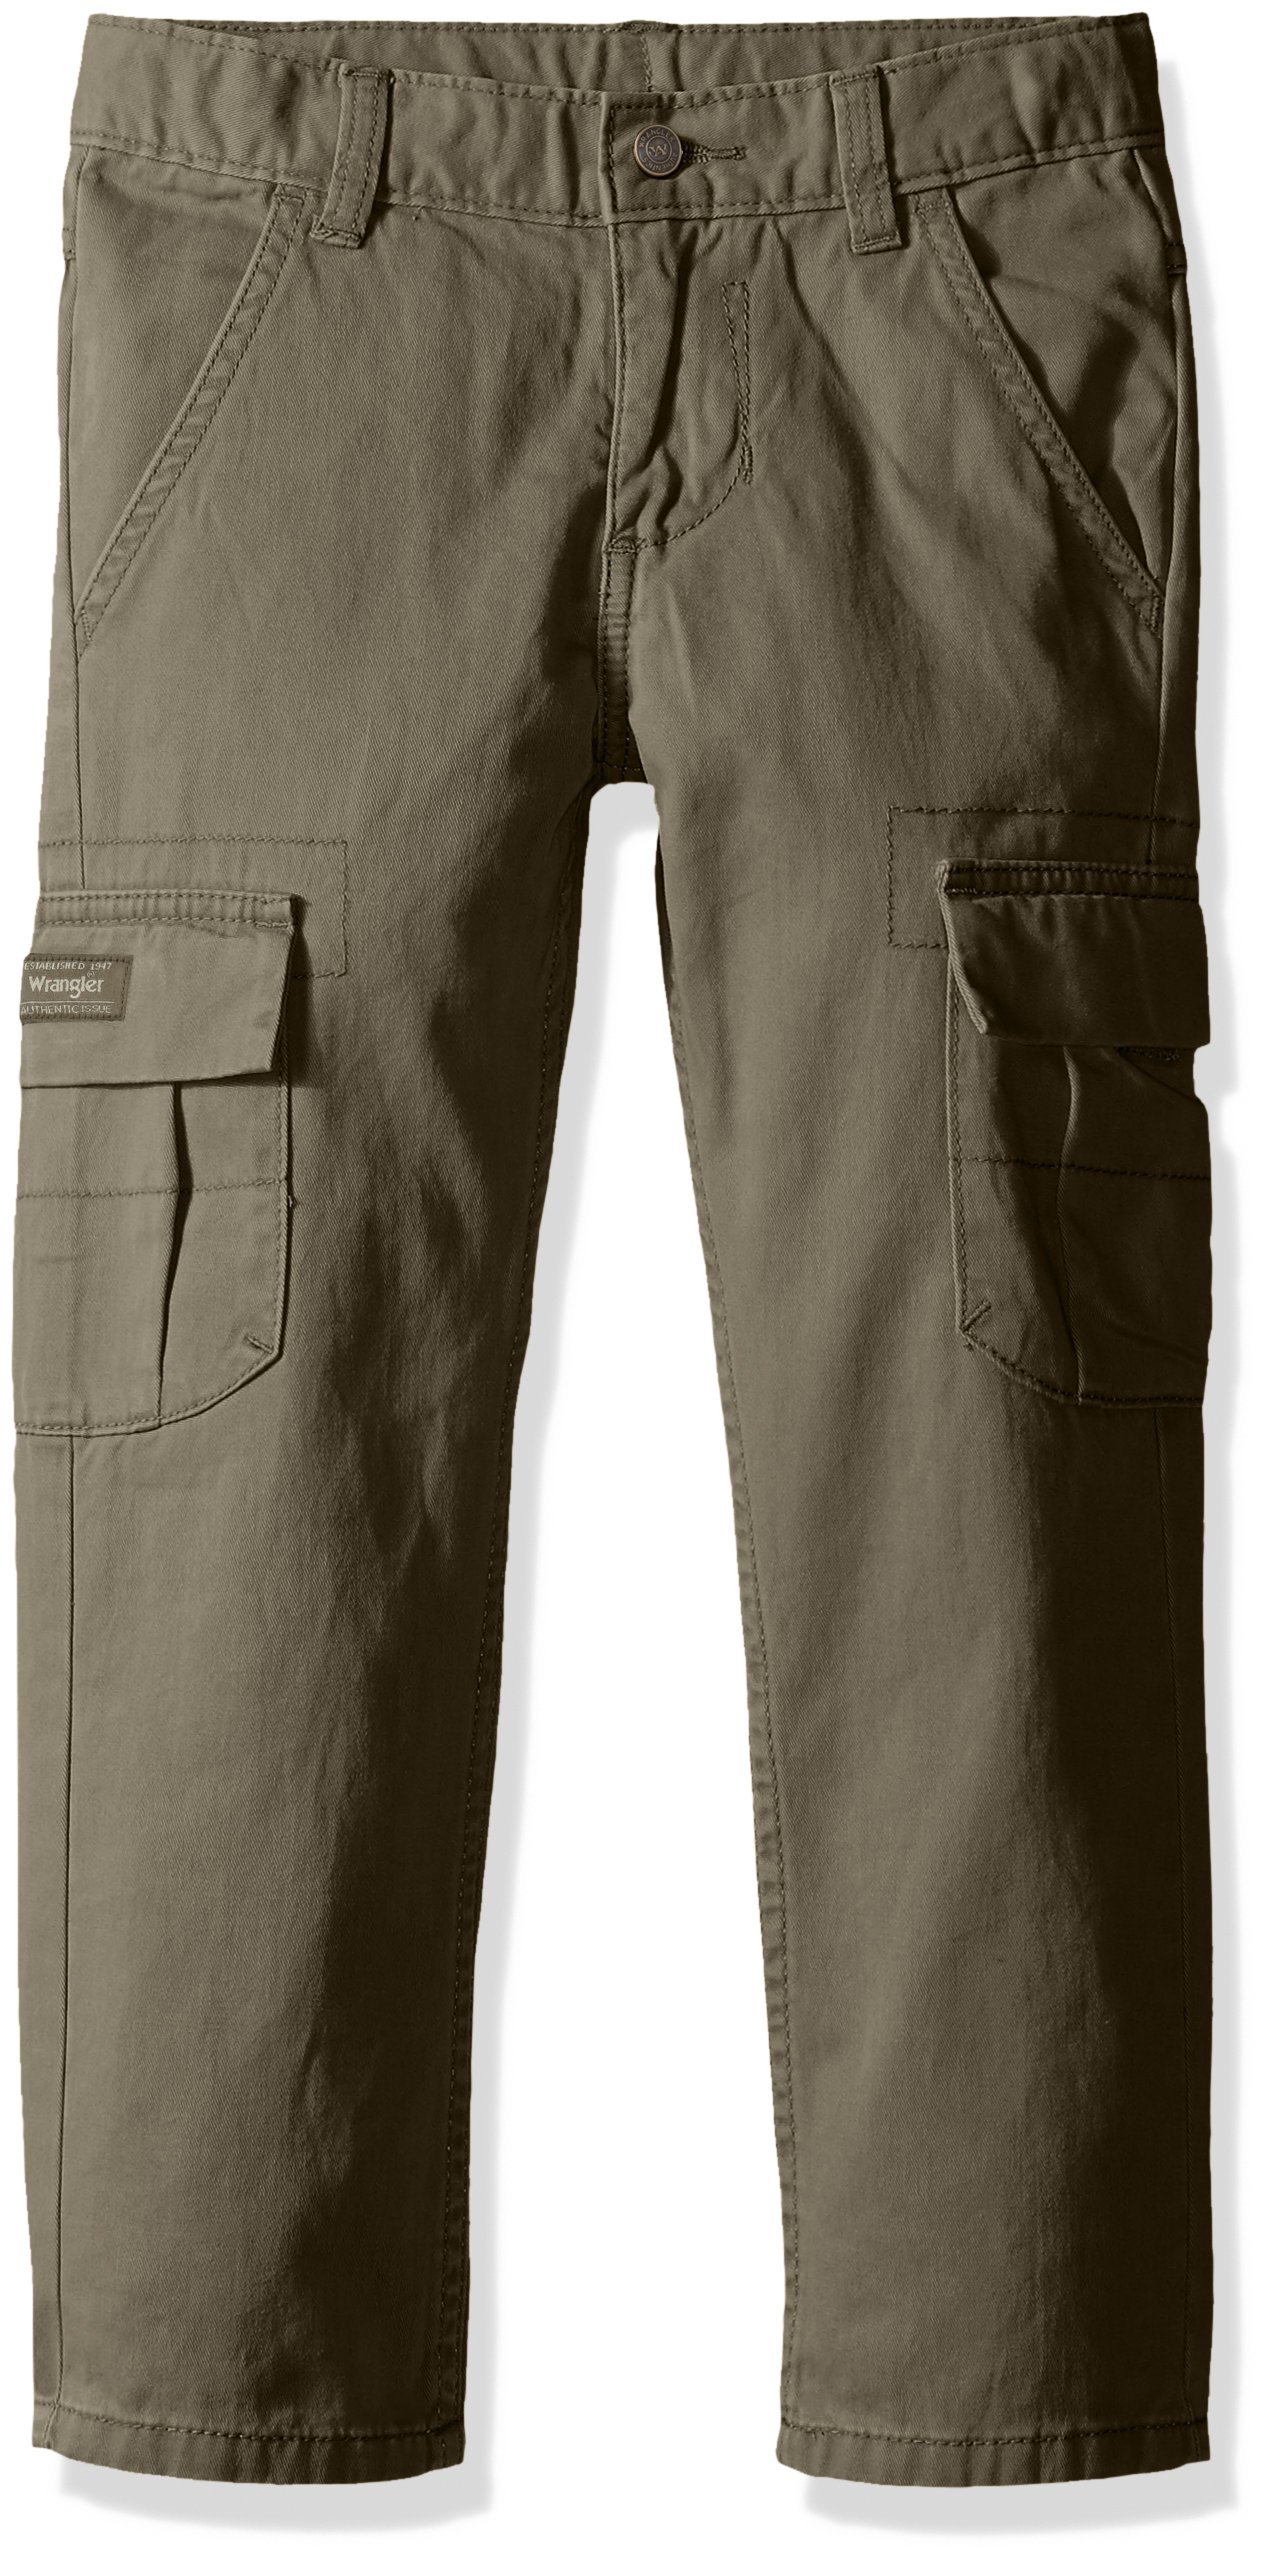 Wrangler Big Boys' Authentics Classic Cargo Pant, Olive, 12